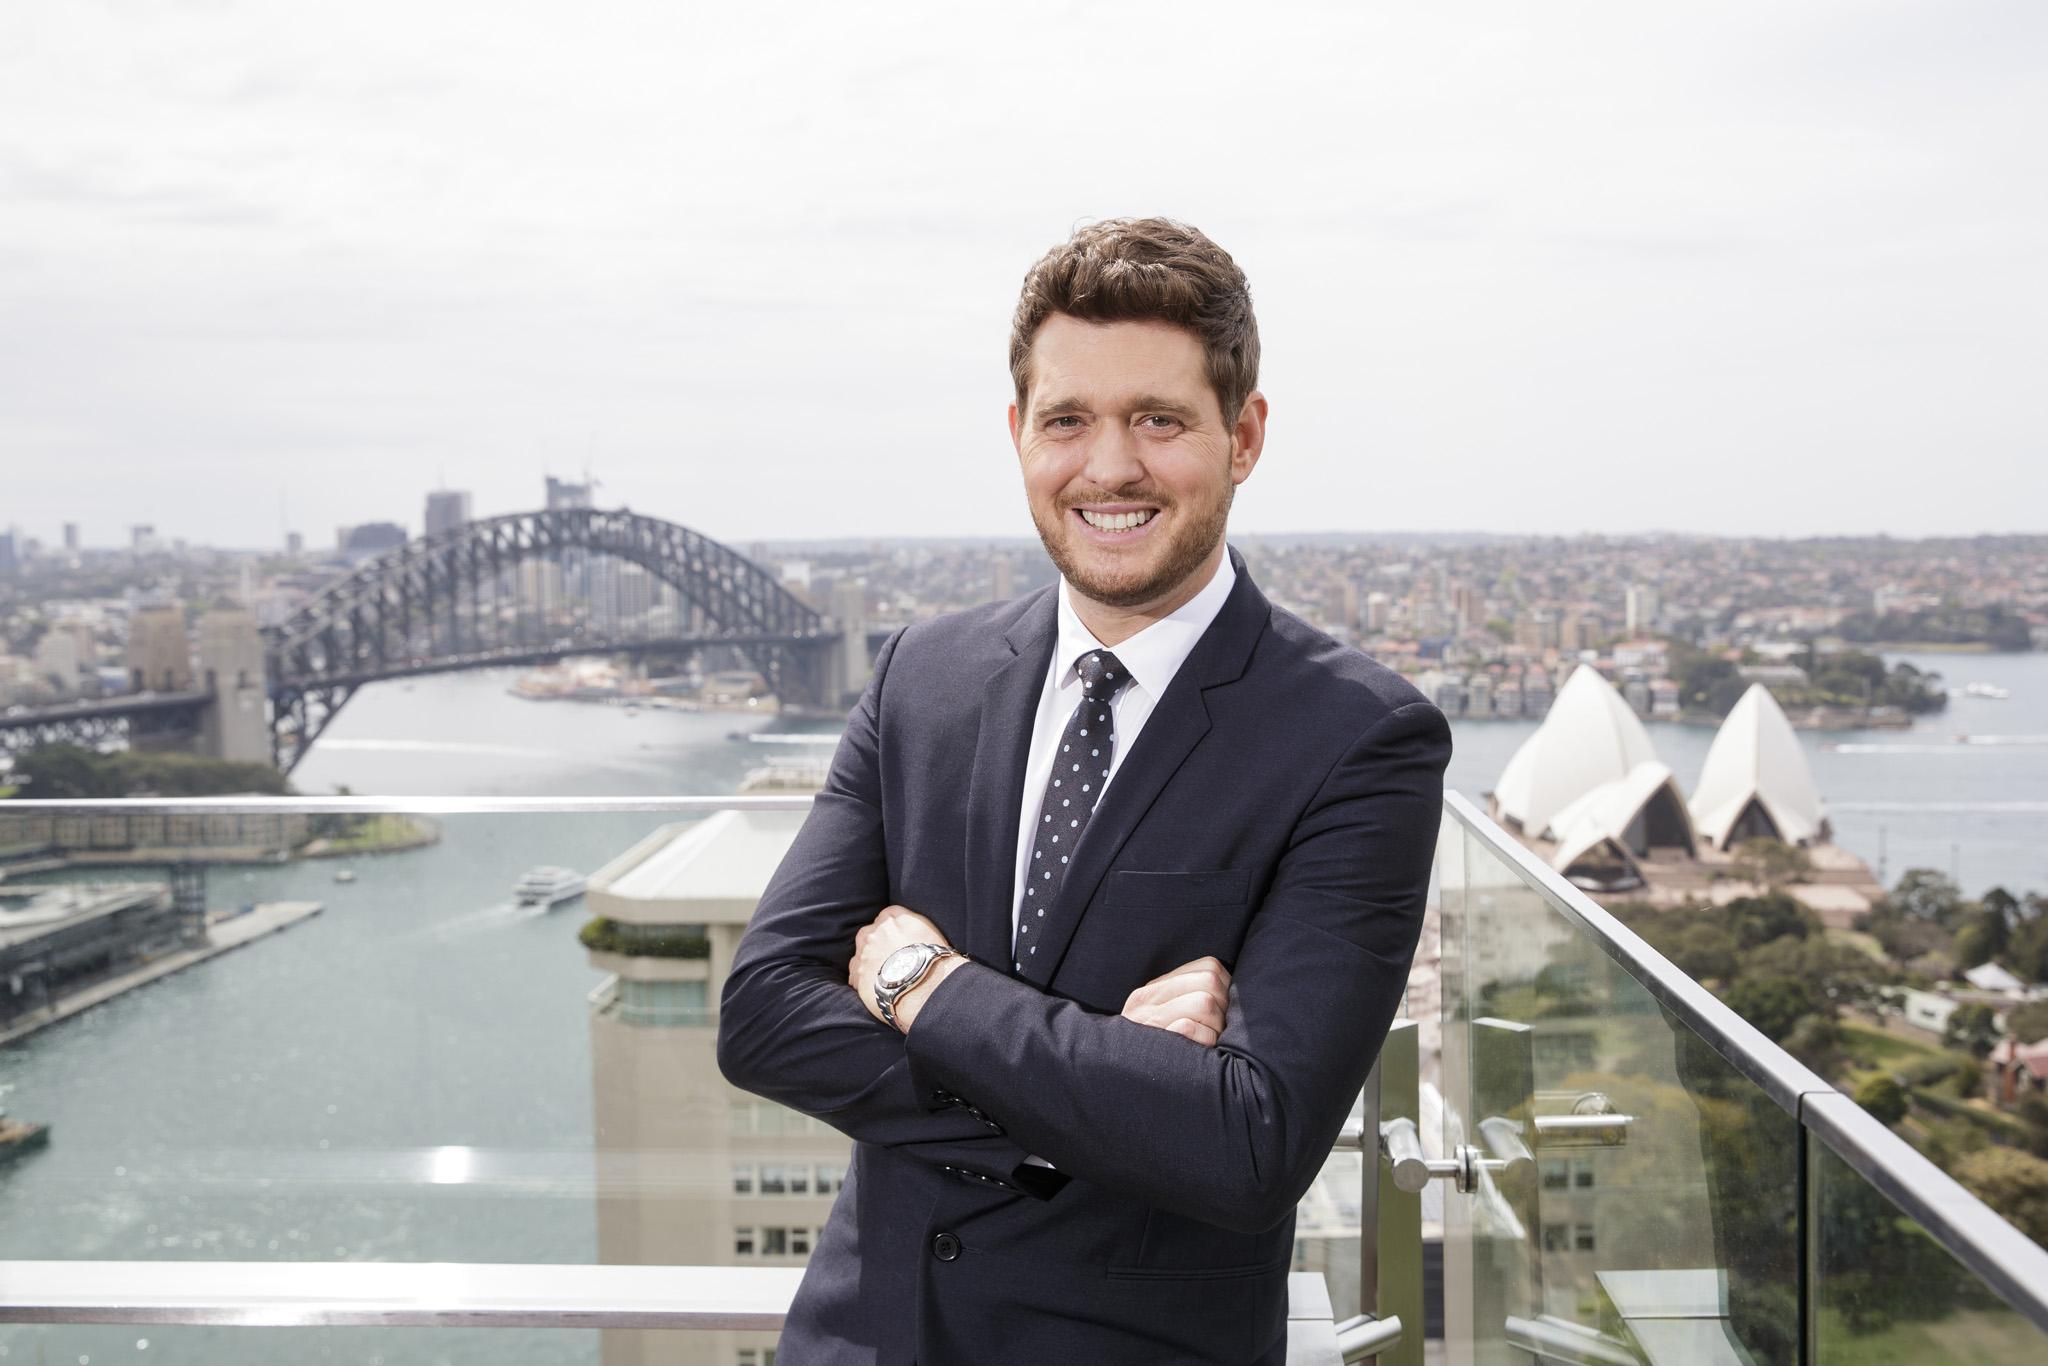 Michael Buble for Warner Music Australia